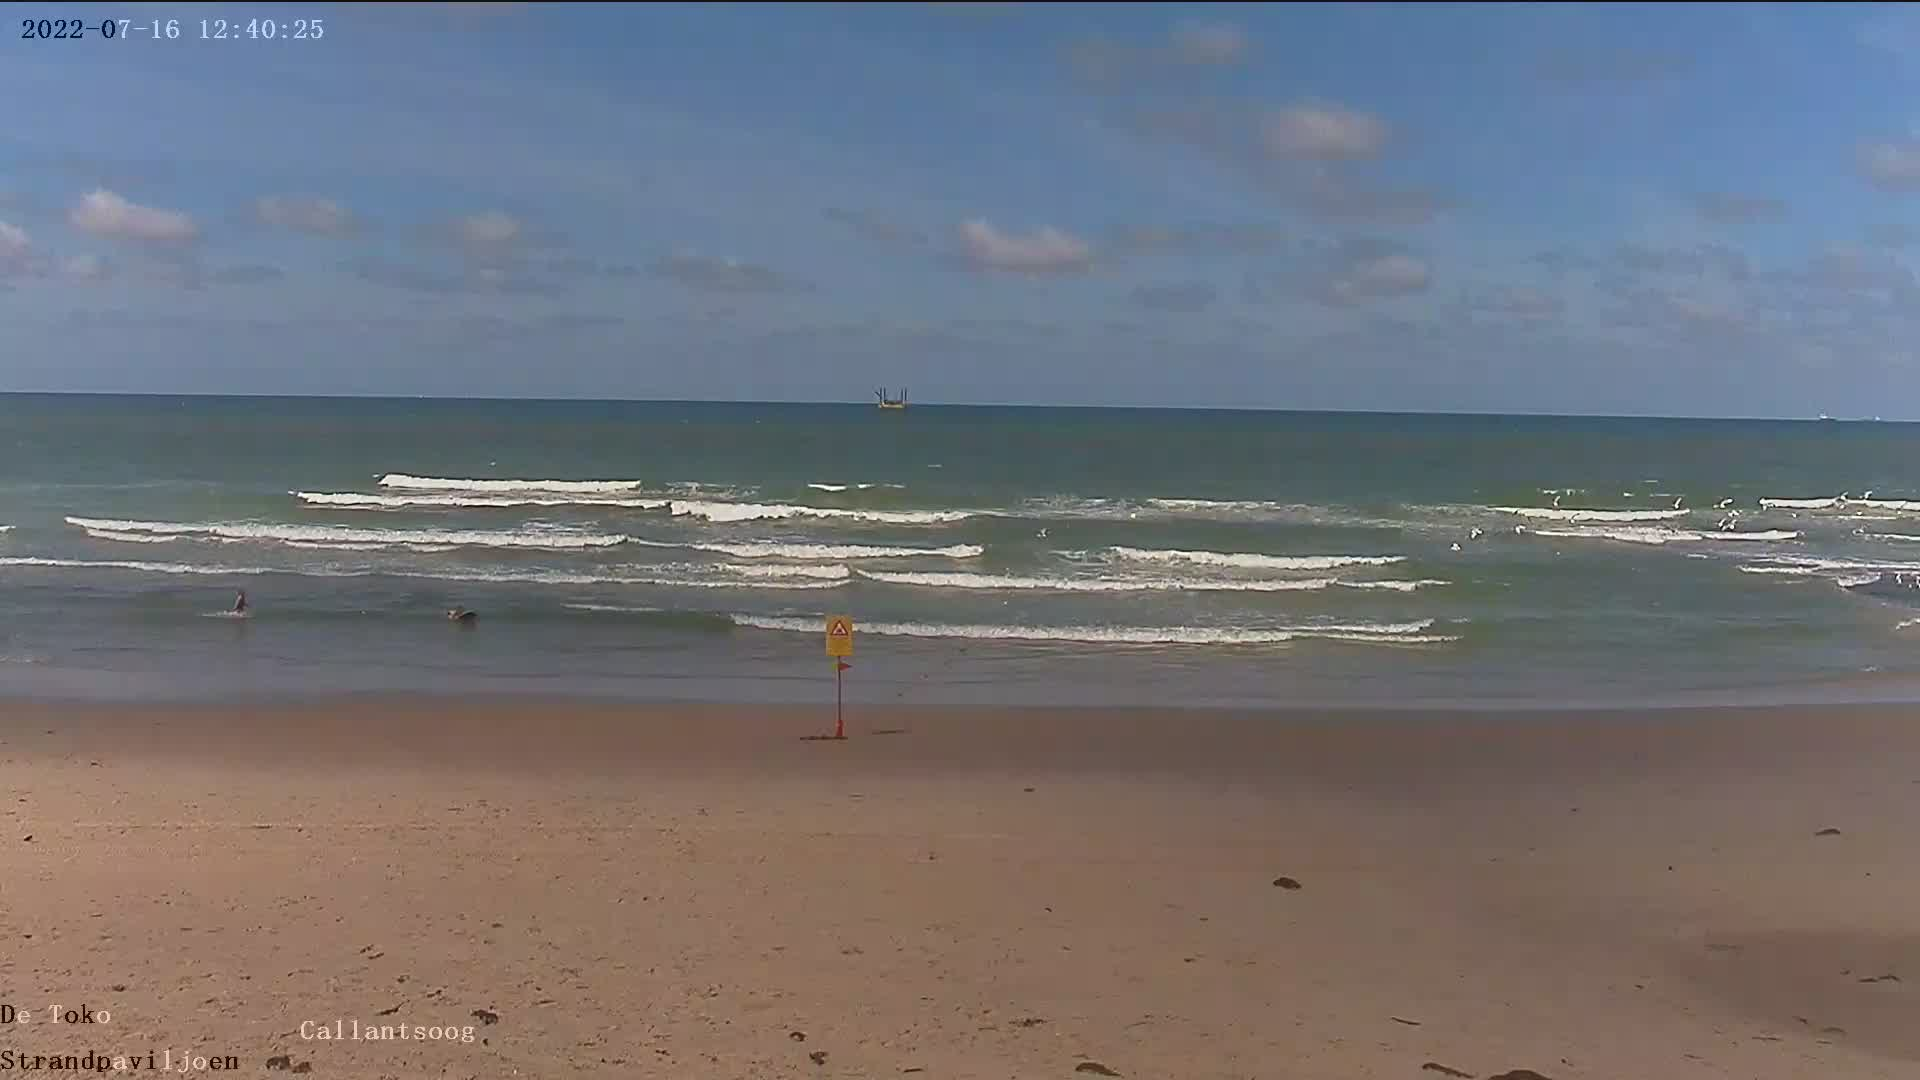 Webcam Callantsoog: HD Beach Panorama  Webcam Callants...